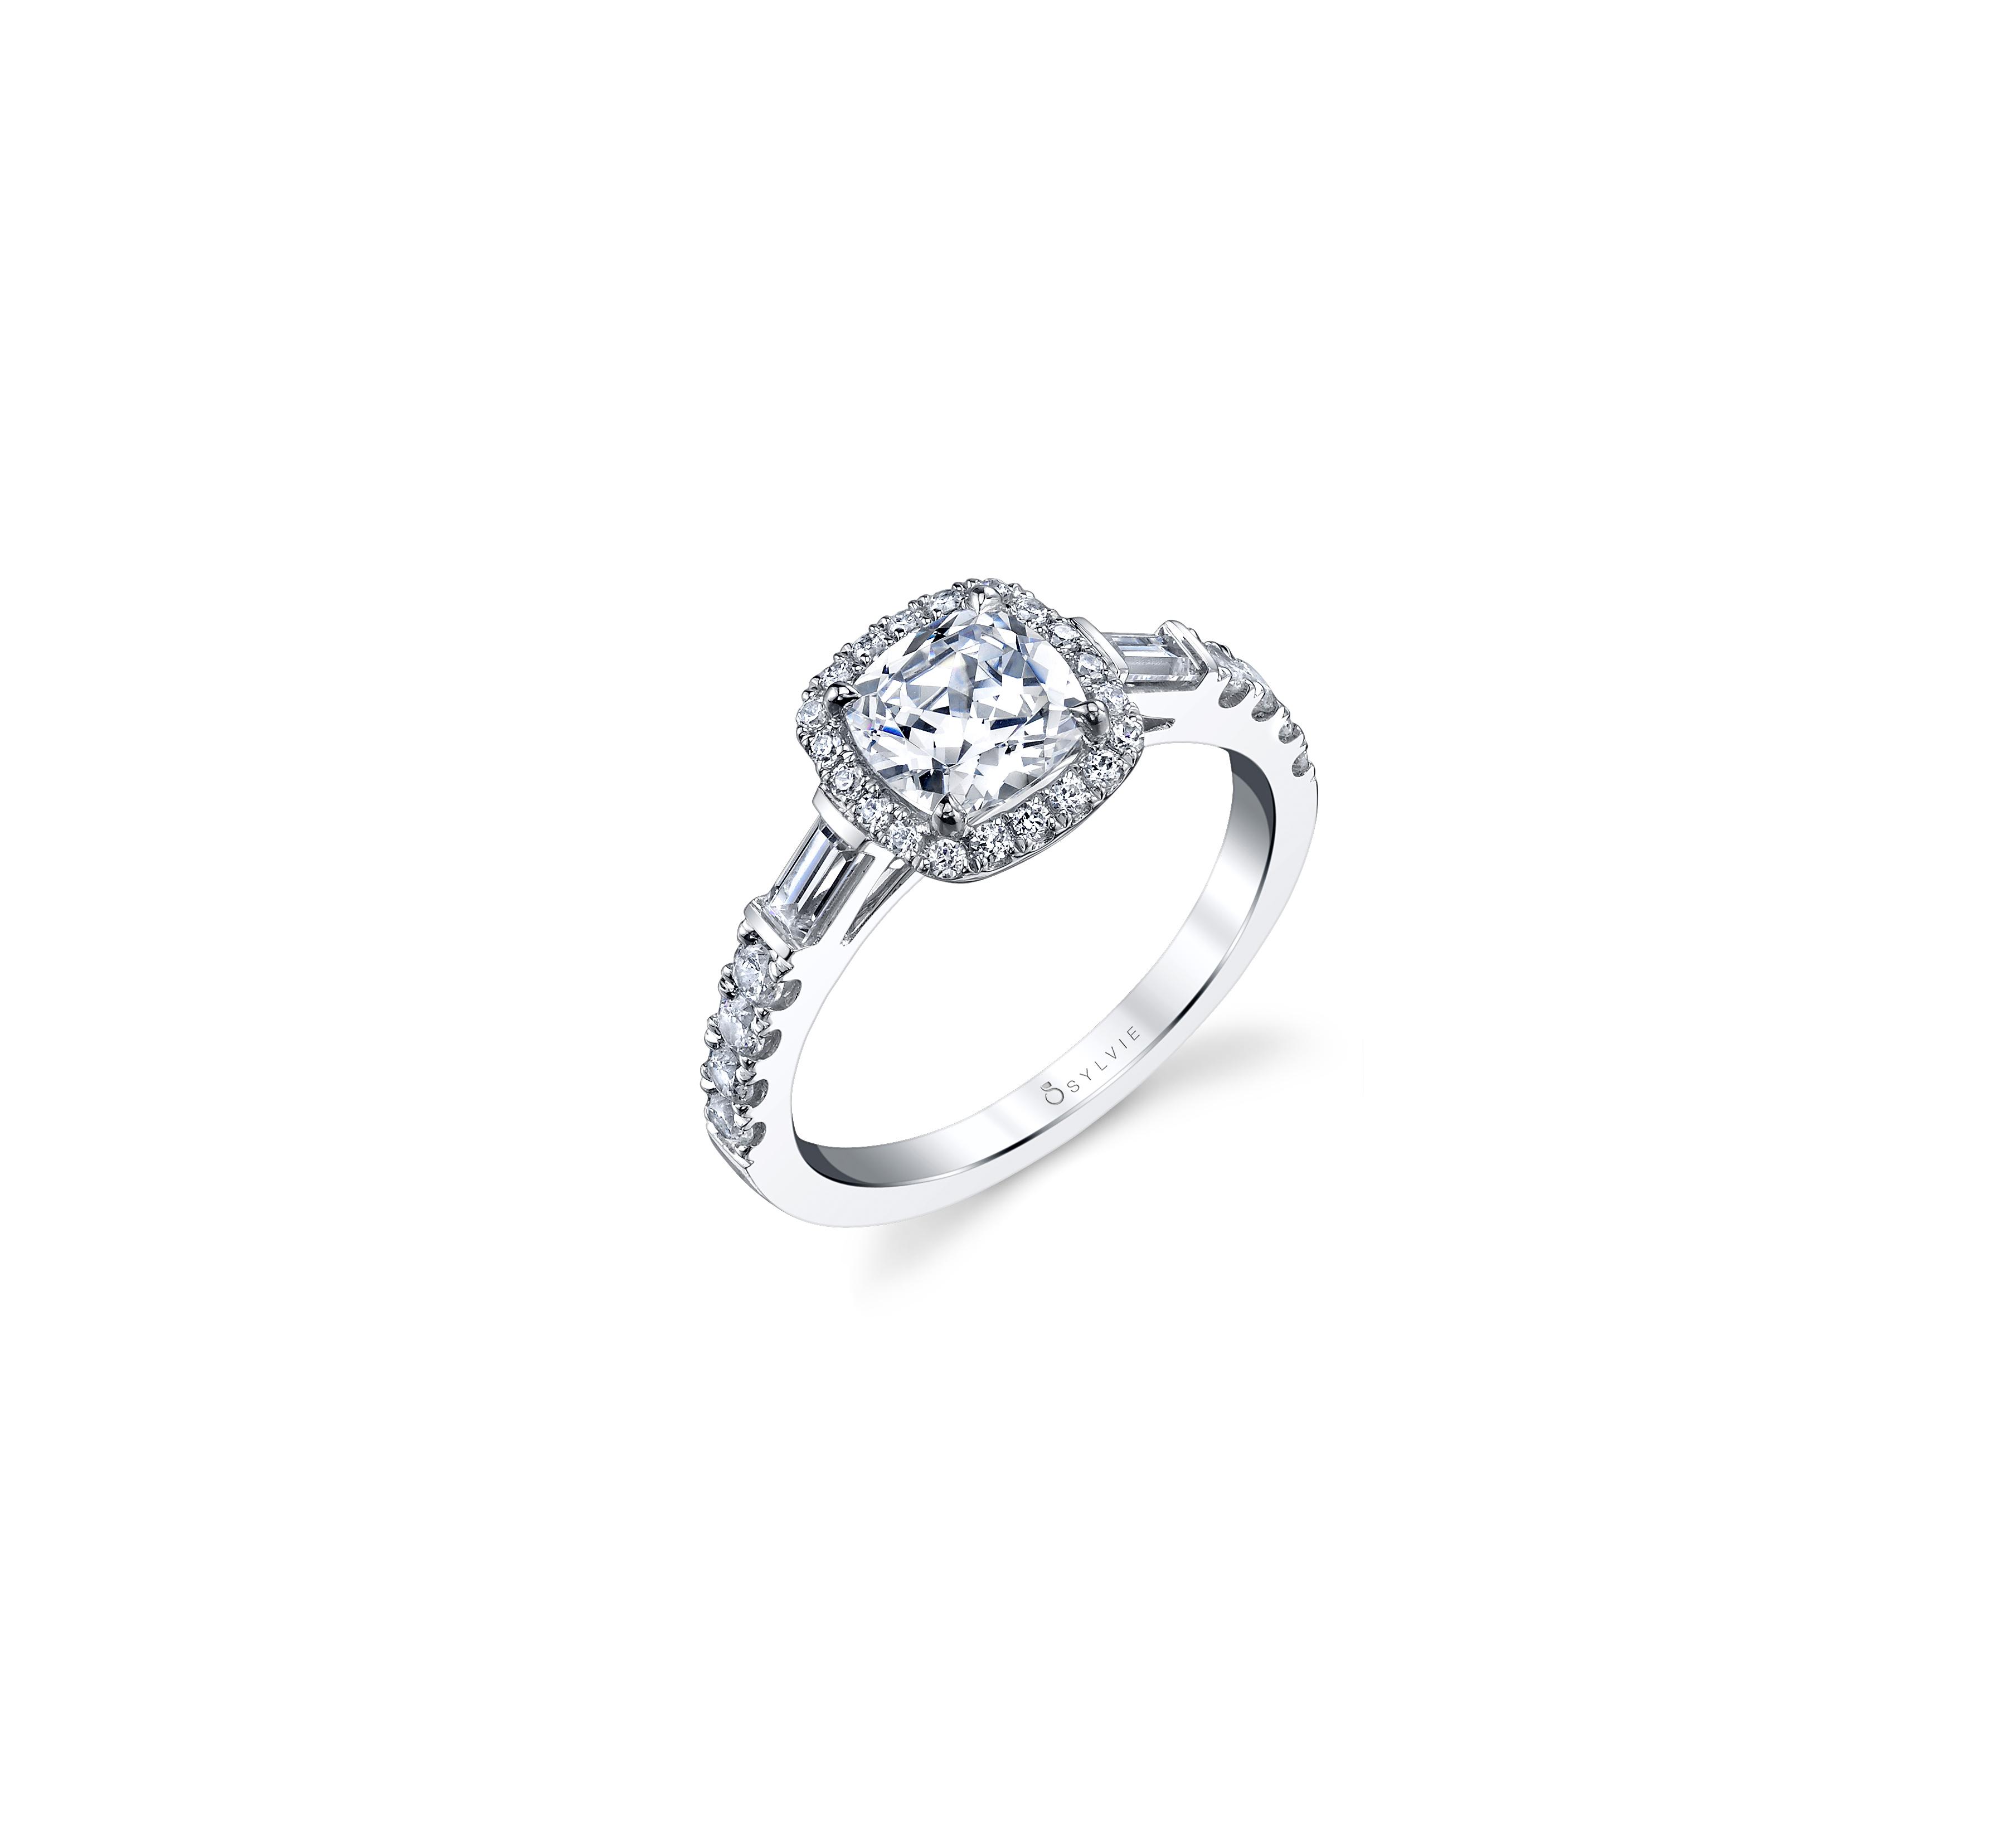 sylvie collection cushion cut engagement ring side baguette diamonds